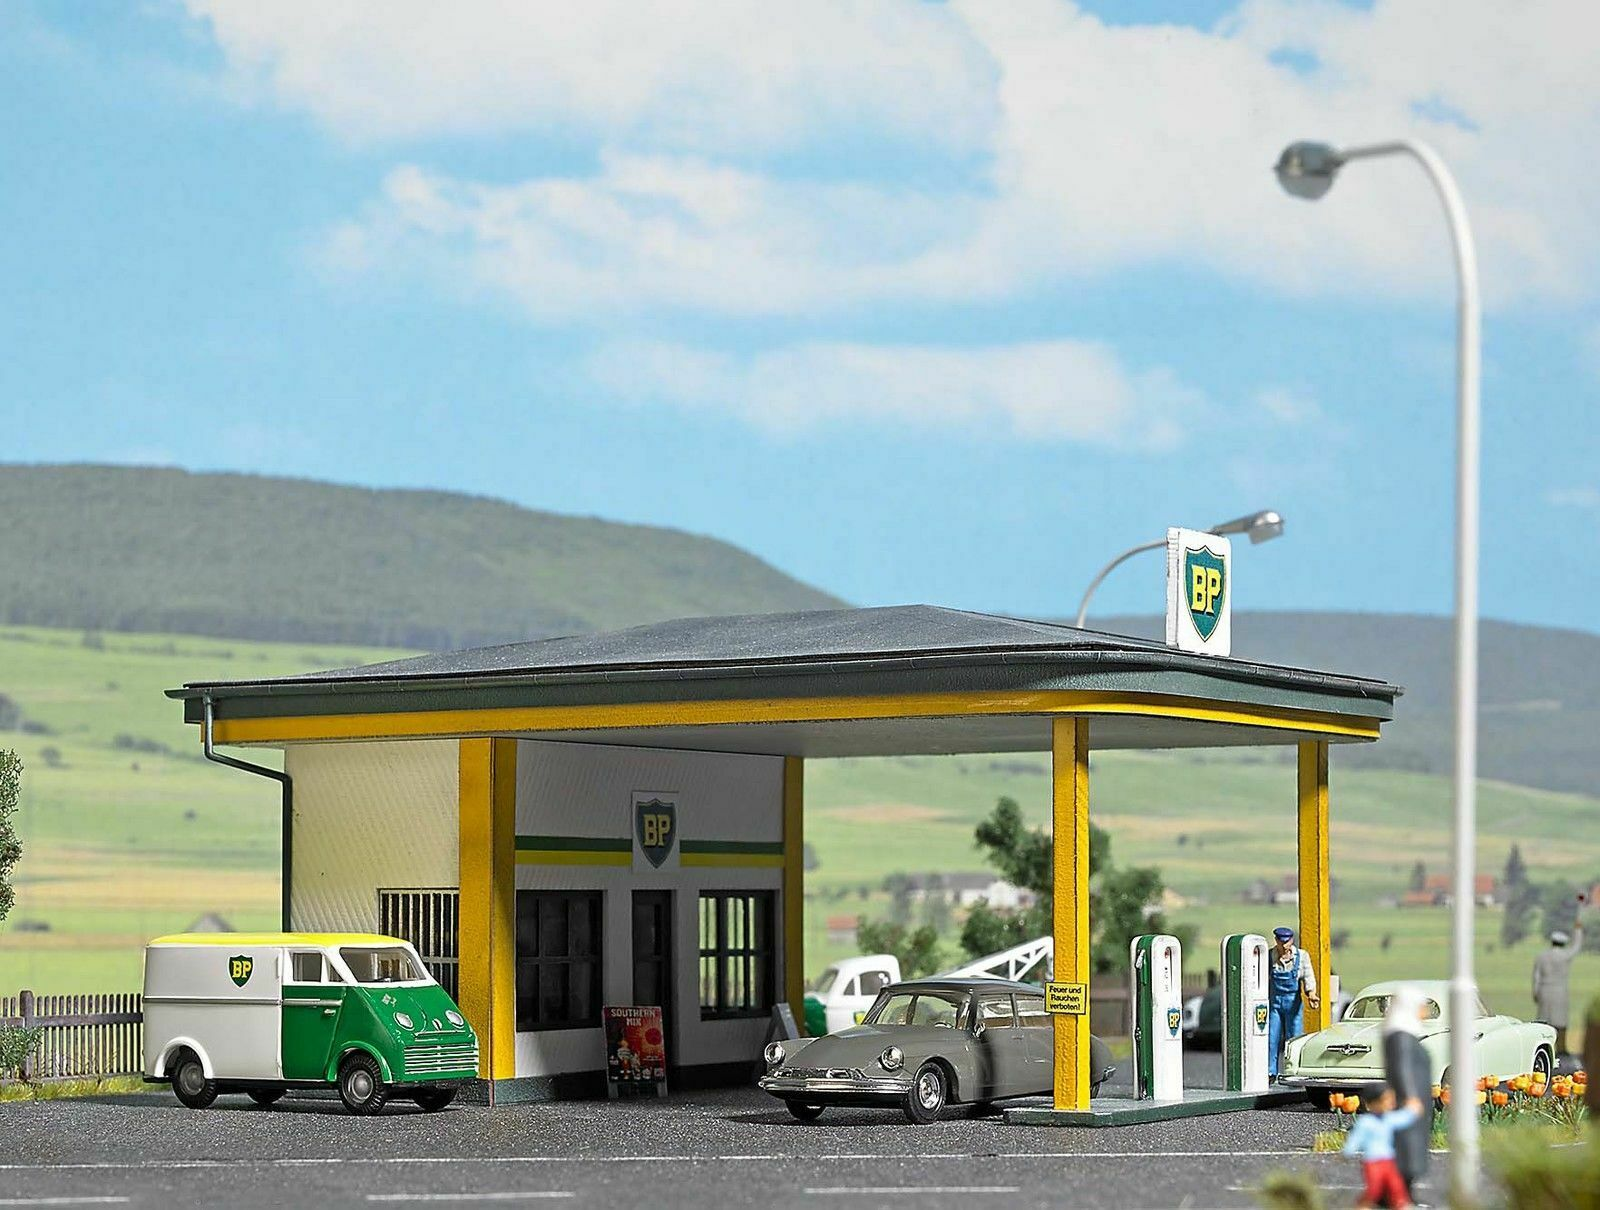 1577 autobusch HO 1 87 Distributore autoburanti BP